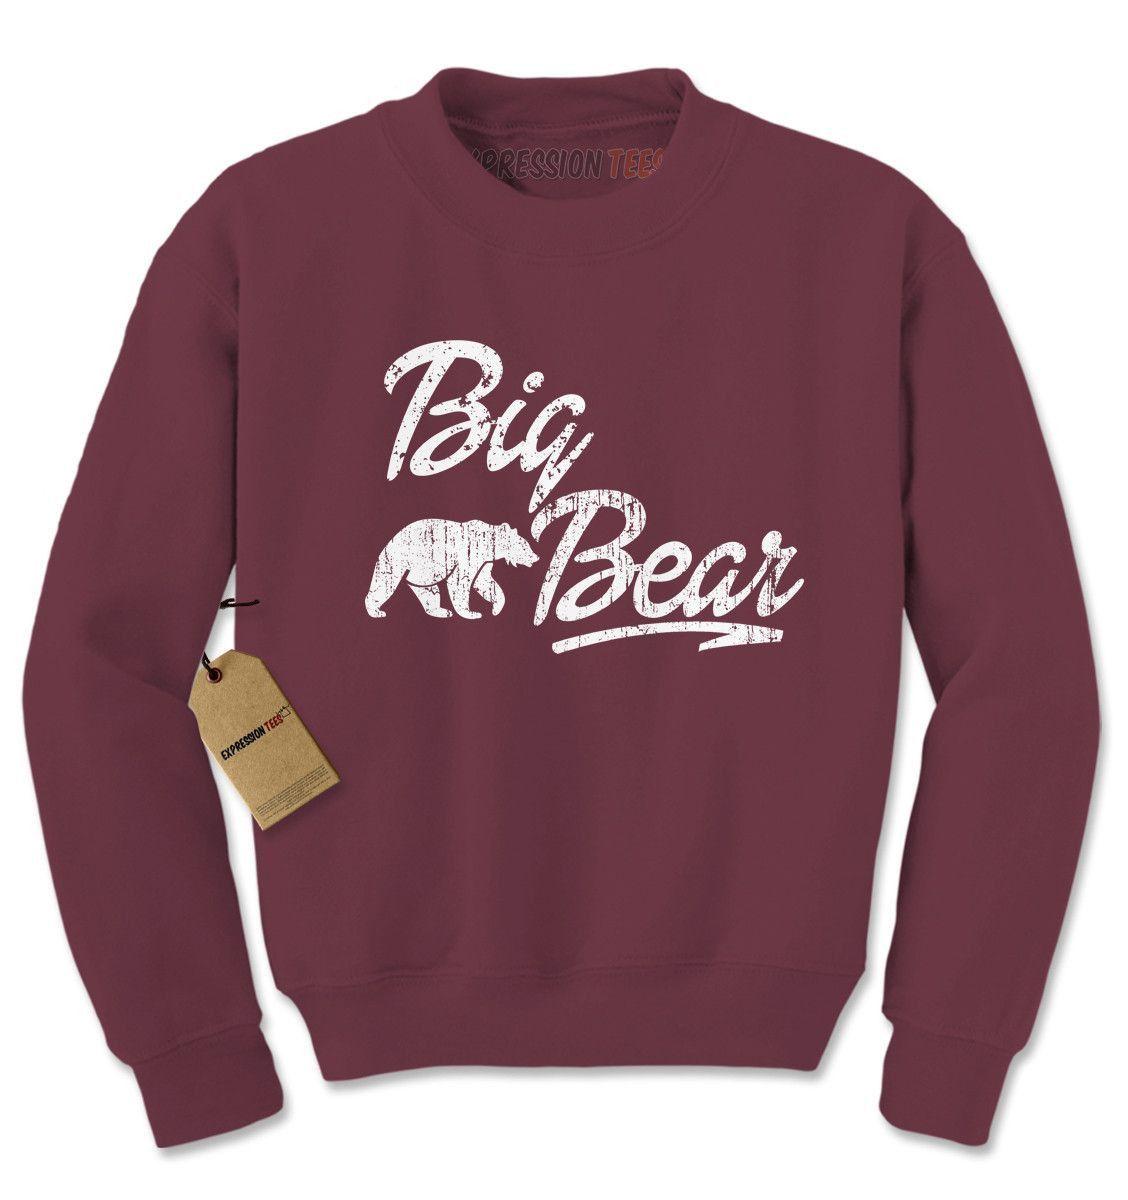 Big Bear Cub Family Adult Crewneck Sweatshirt